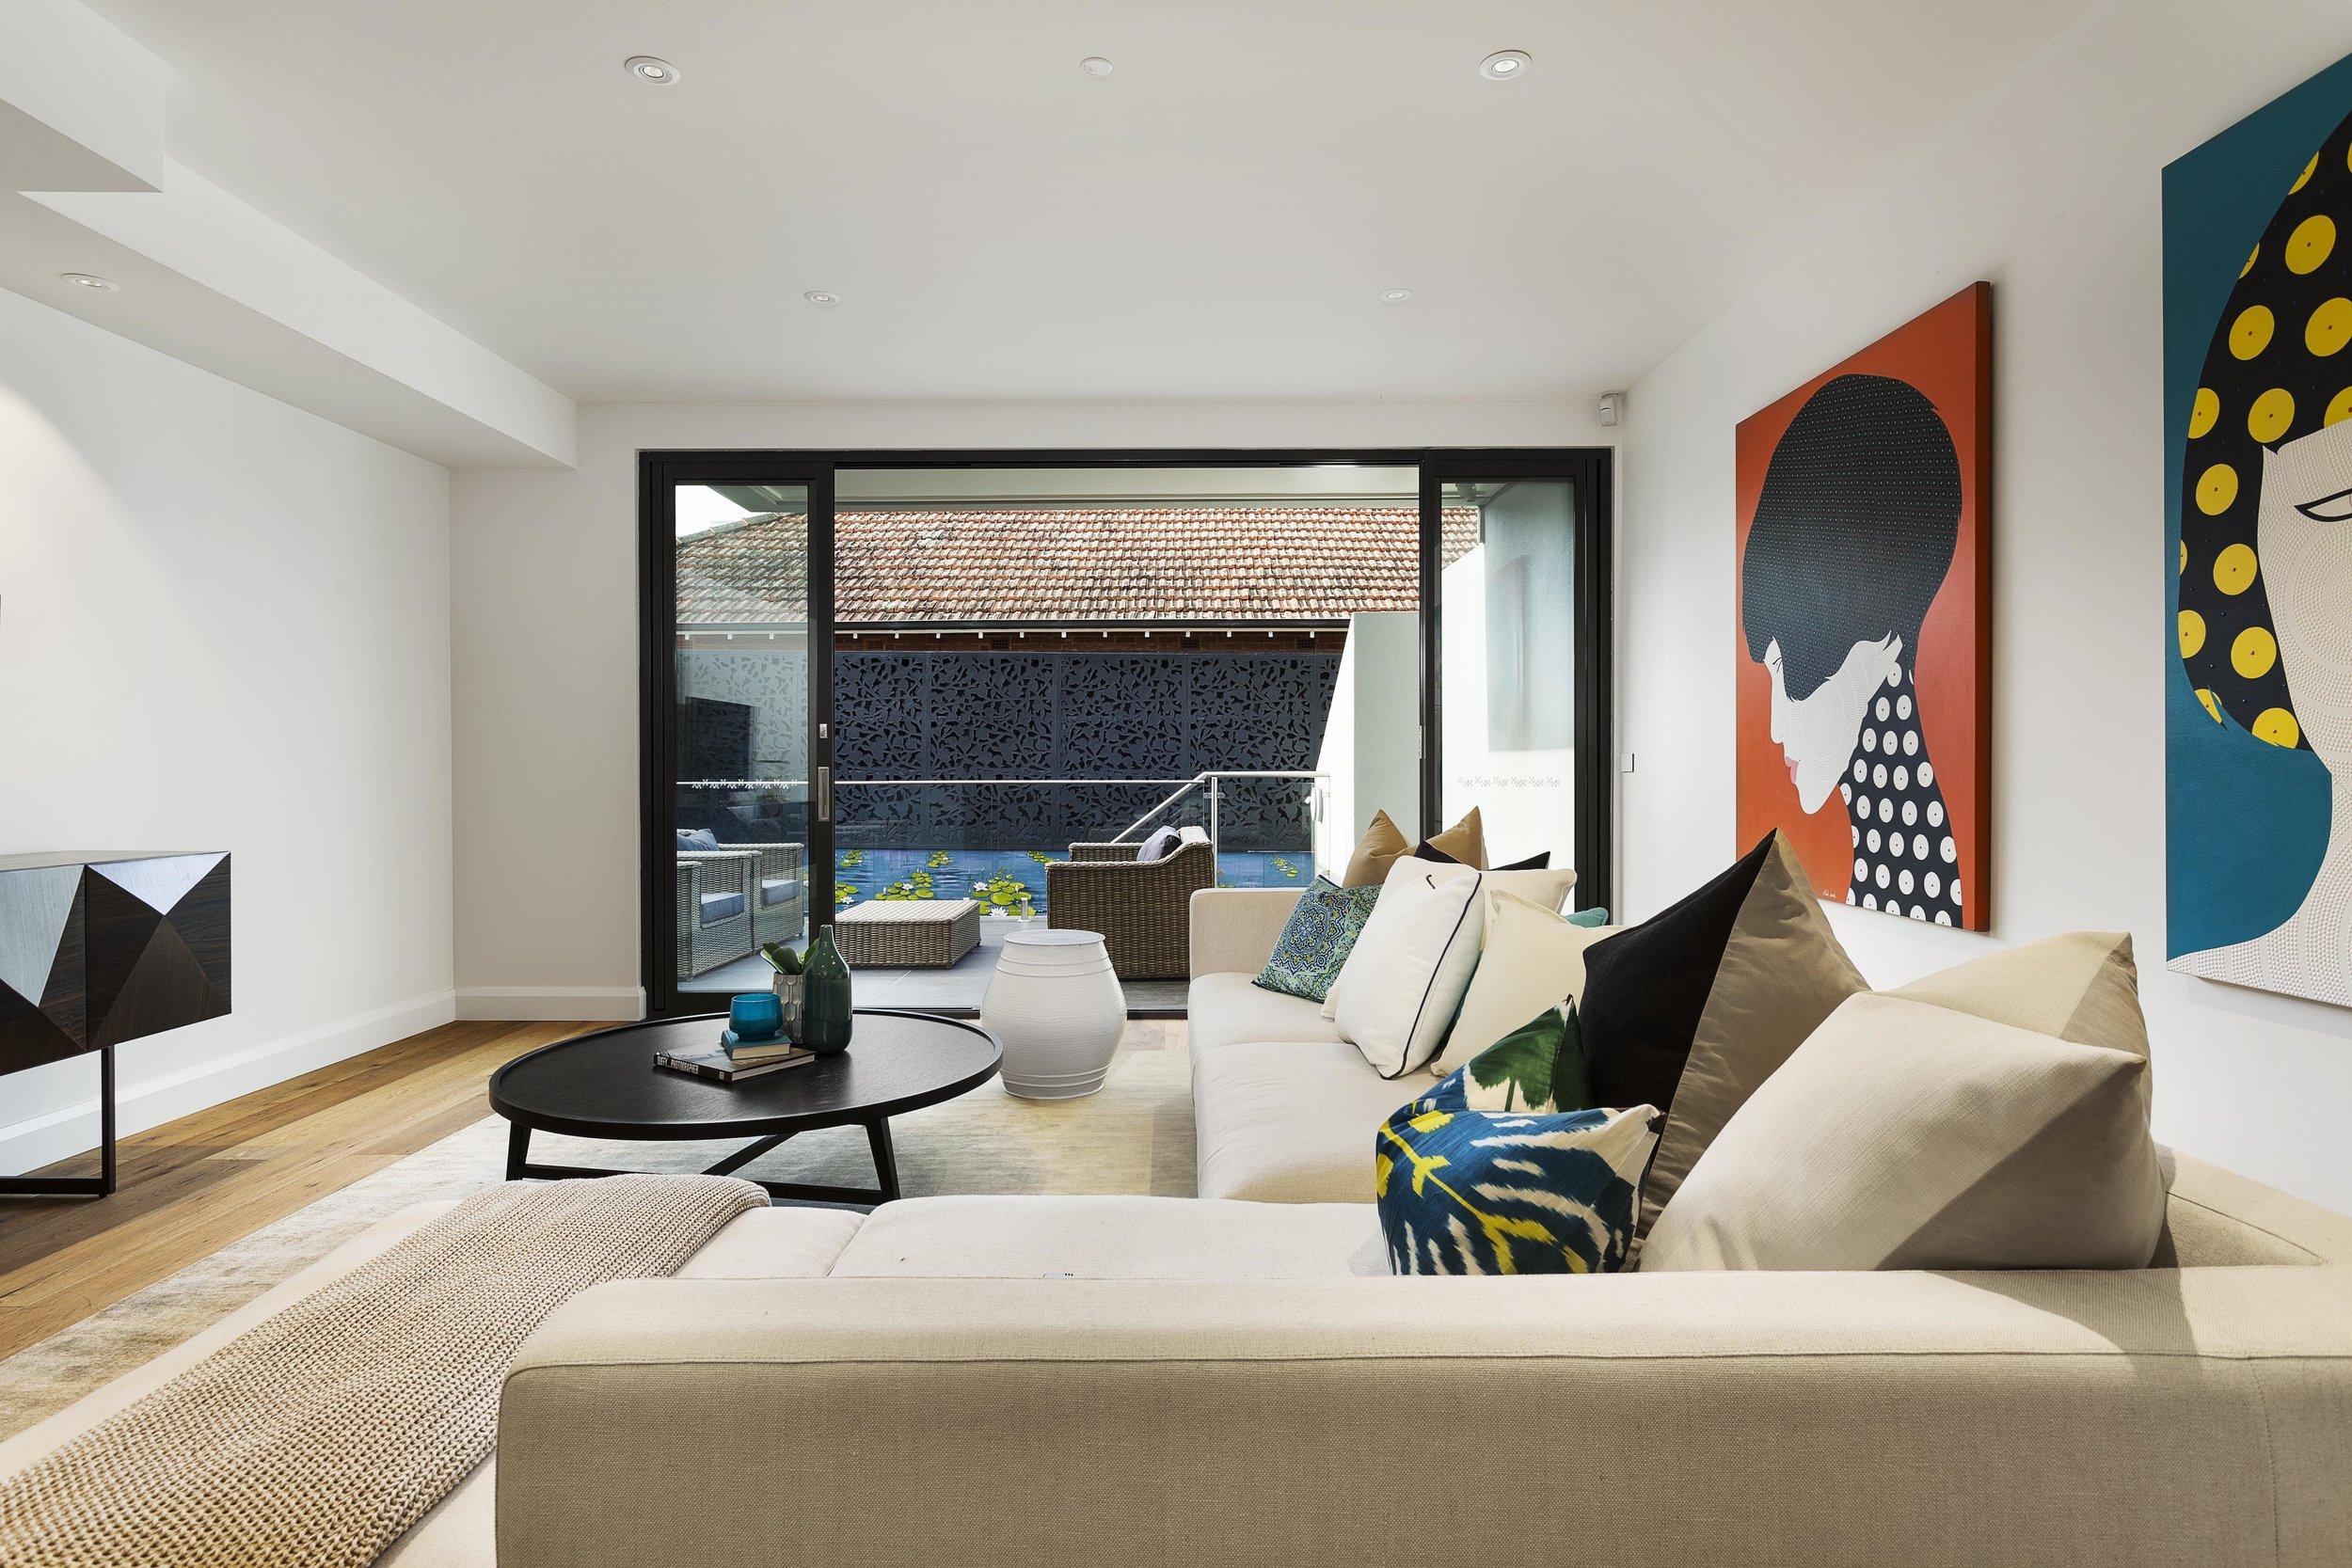 Armadale-Residence-Guymer-Bailey-Architects-03.jpg